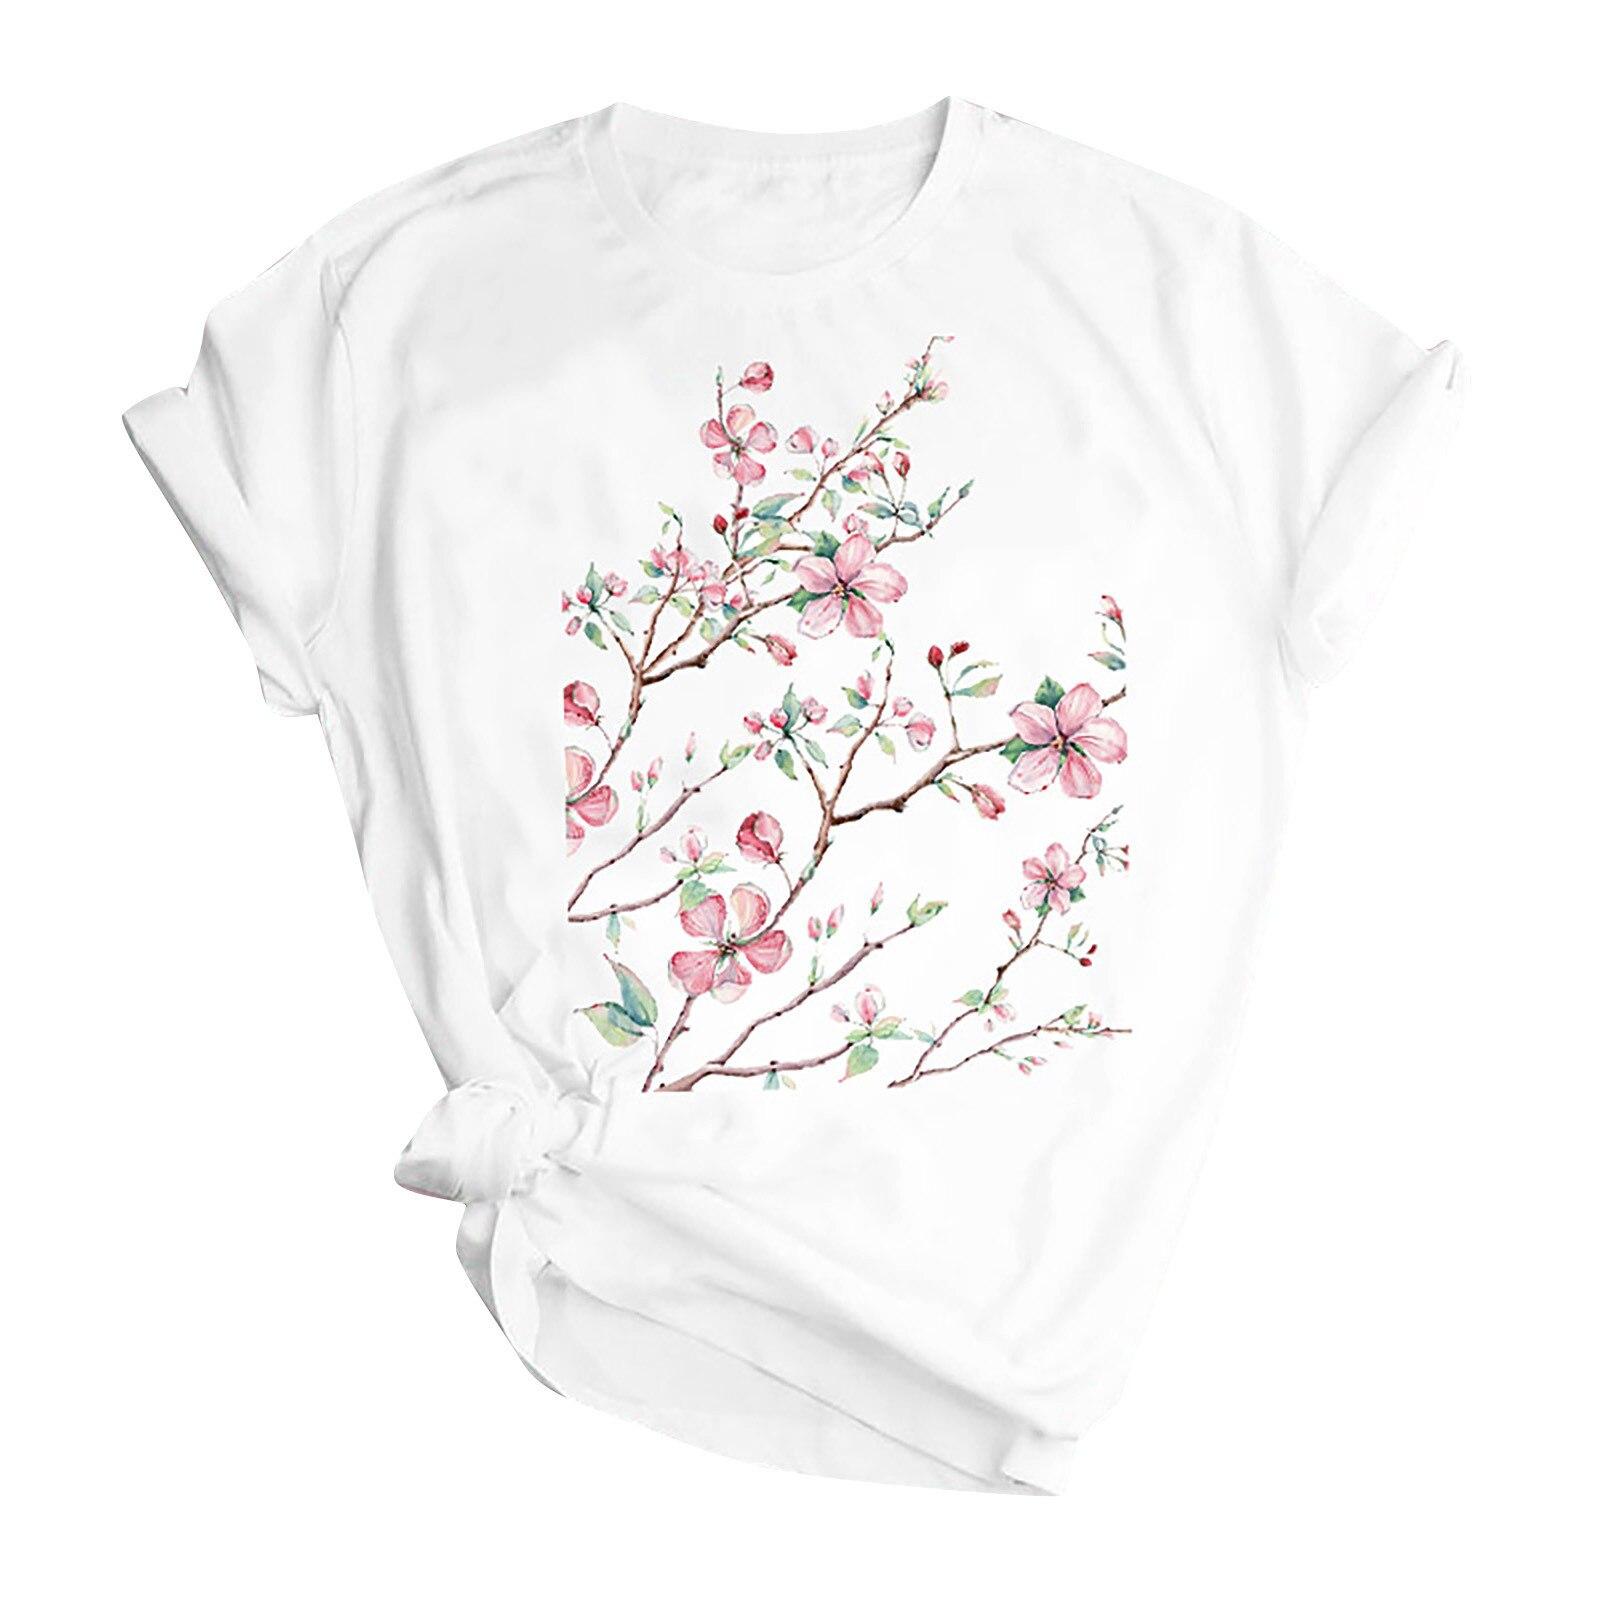 Woman Butterfly Tree Print Harajuku Summer Tshirts Casual Round Neck Short Slee Top Tee Shirt,Drop Ship